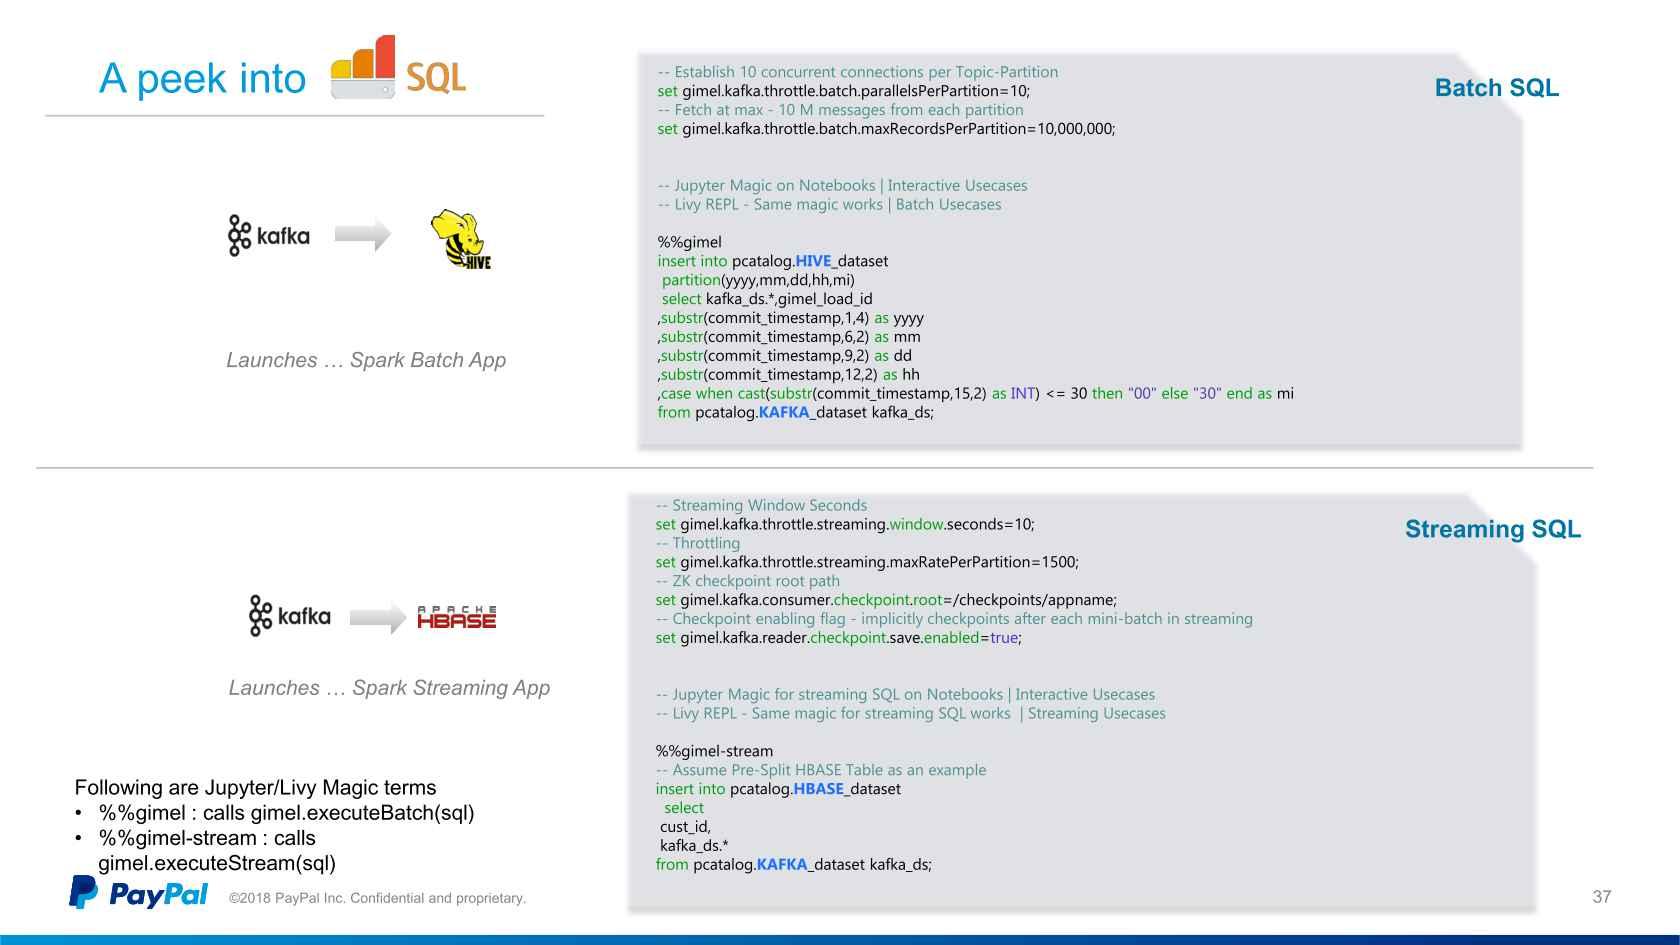 Gimel: PayPal's Analytics Data Platform